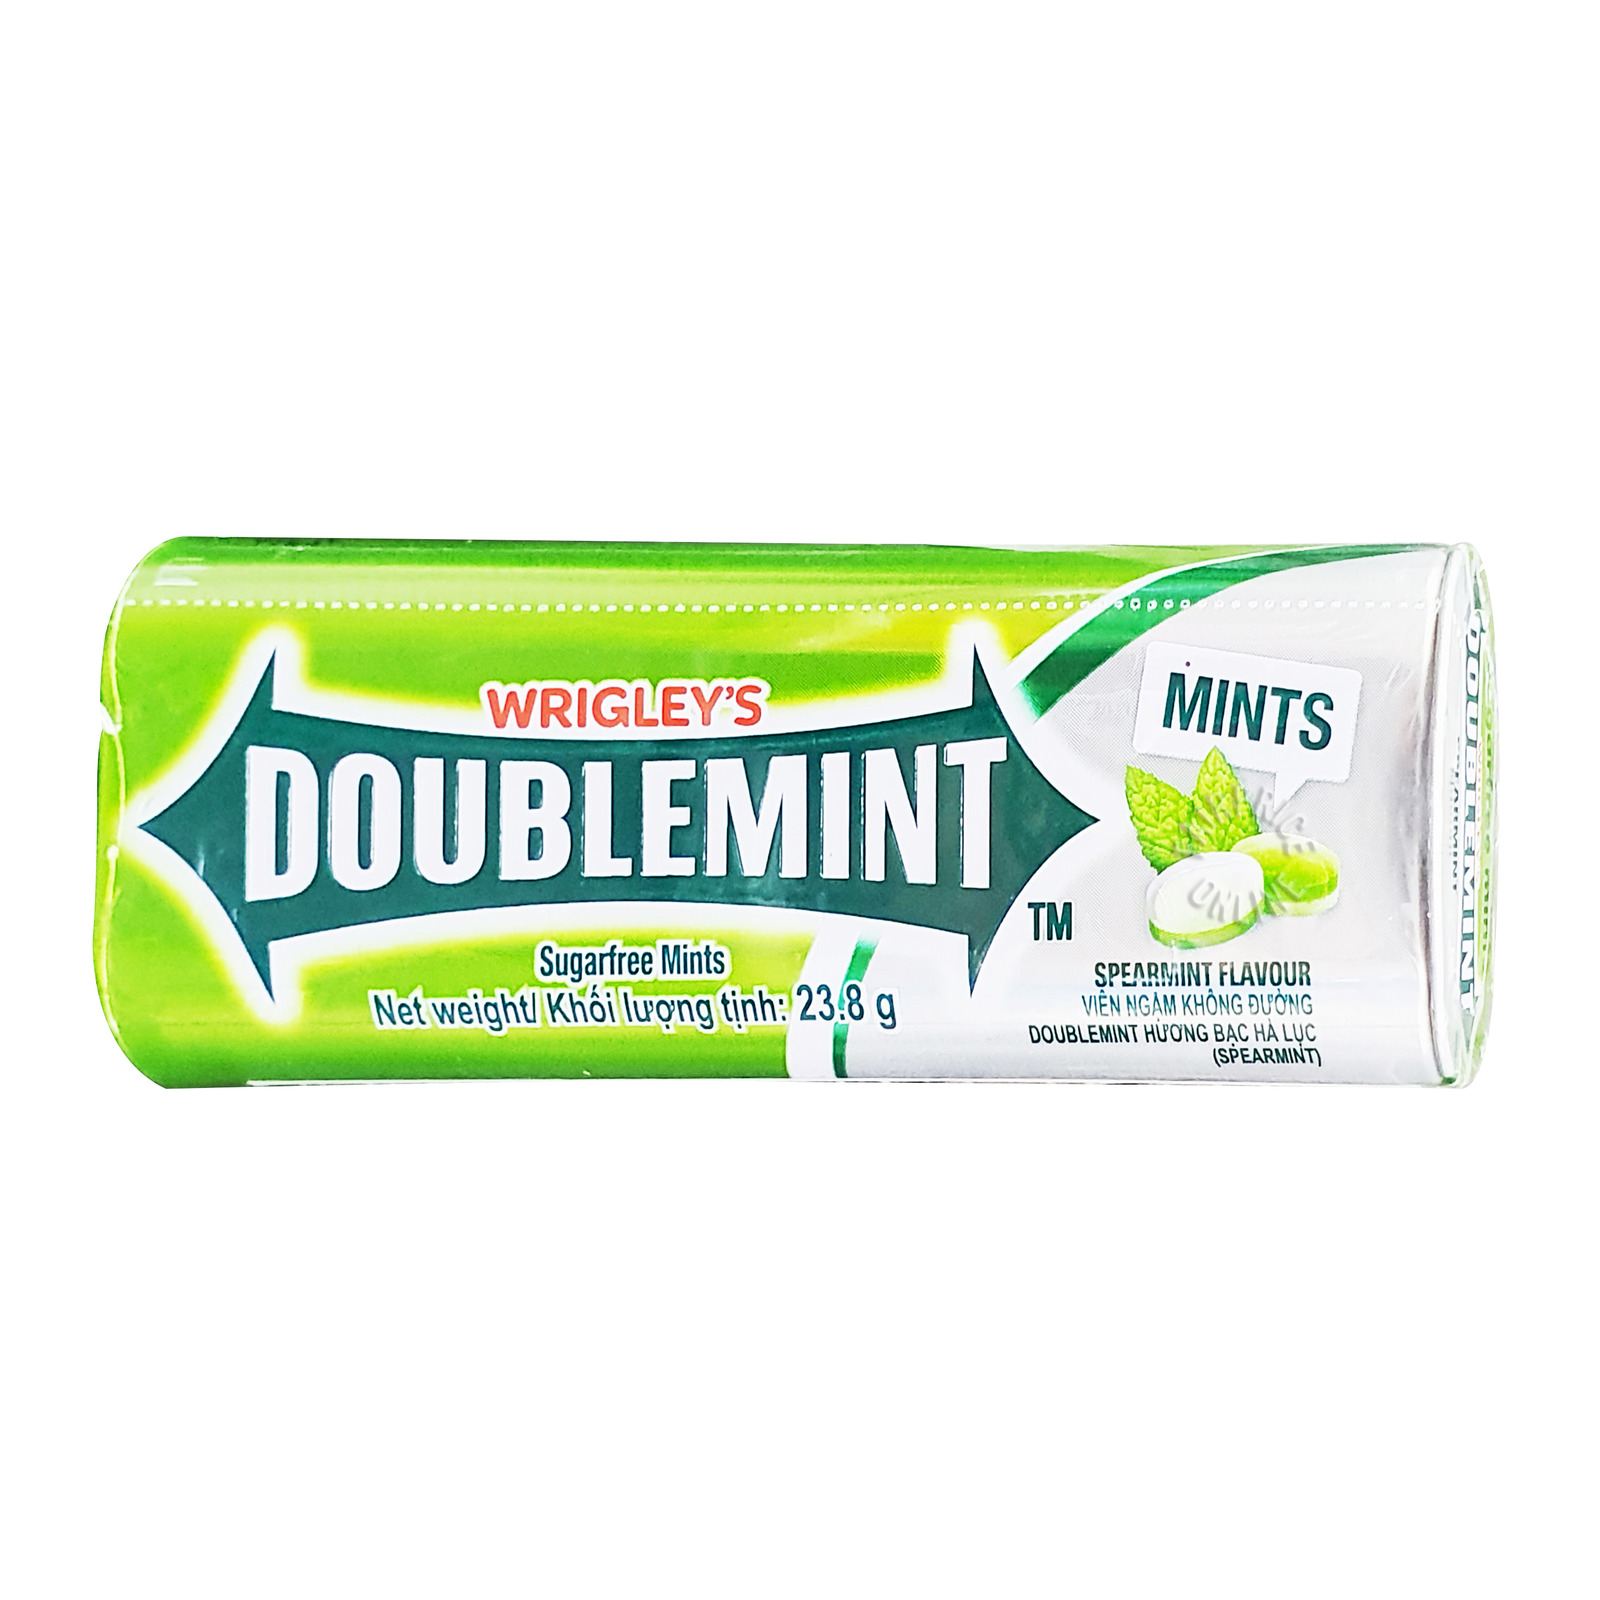 Wrigley's Doublemint Sugarfree Mints - Spearmint